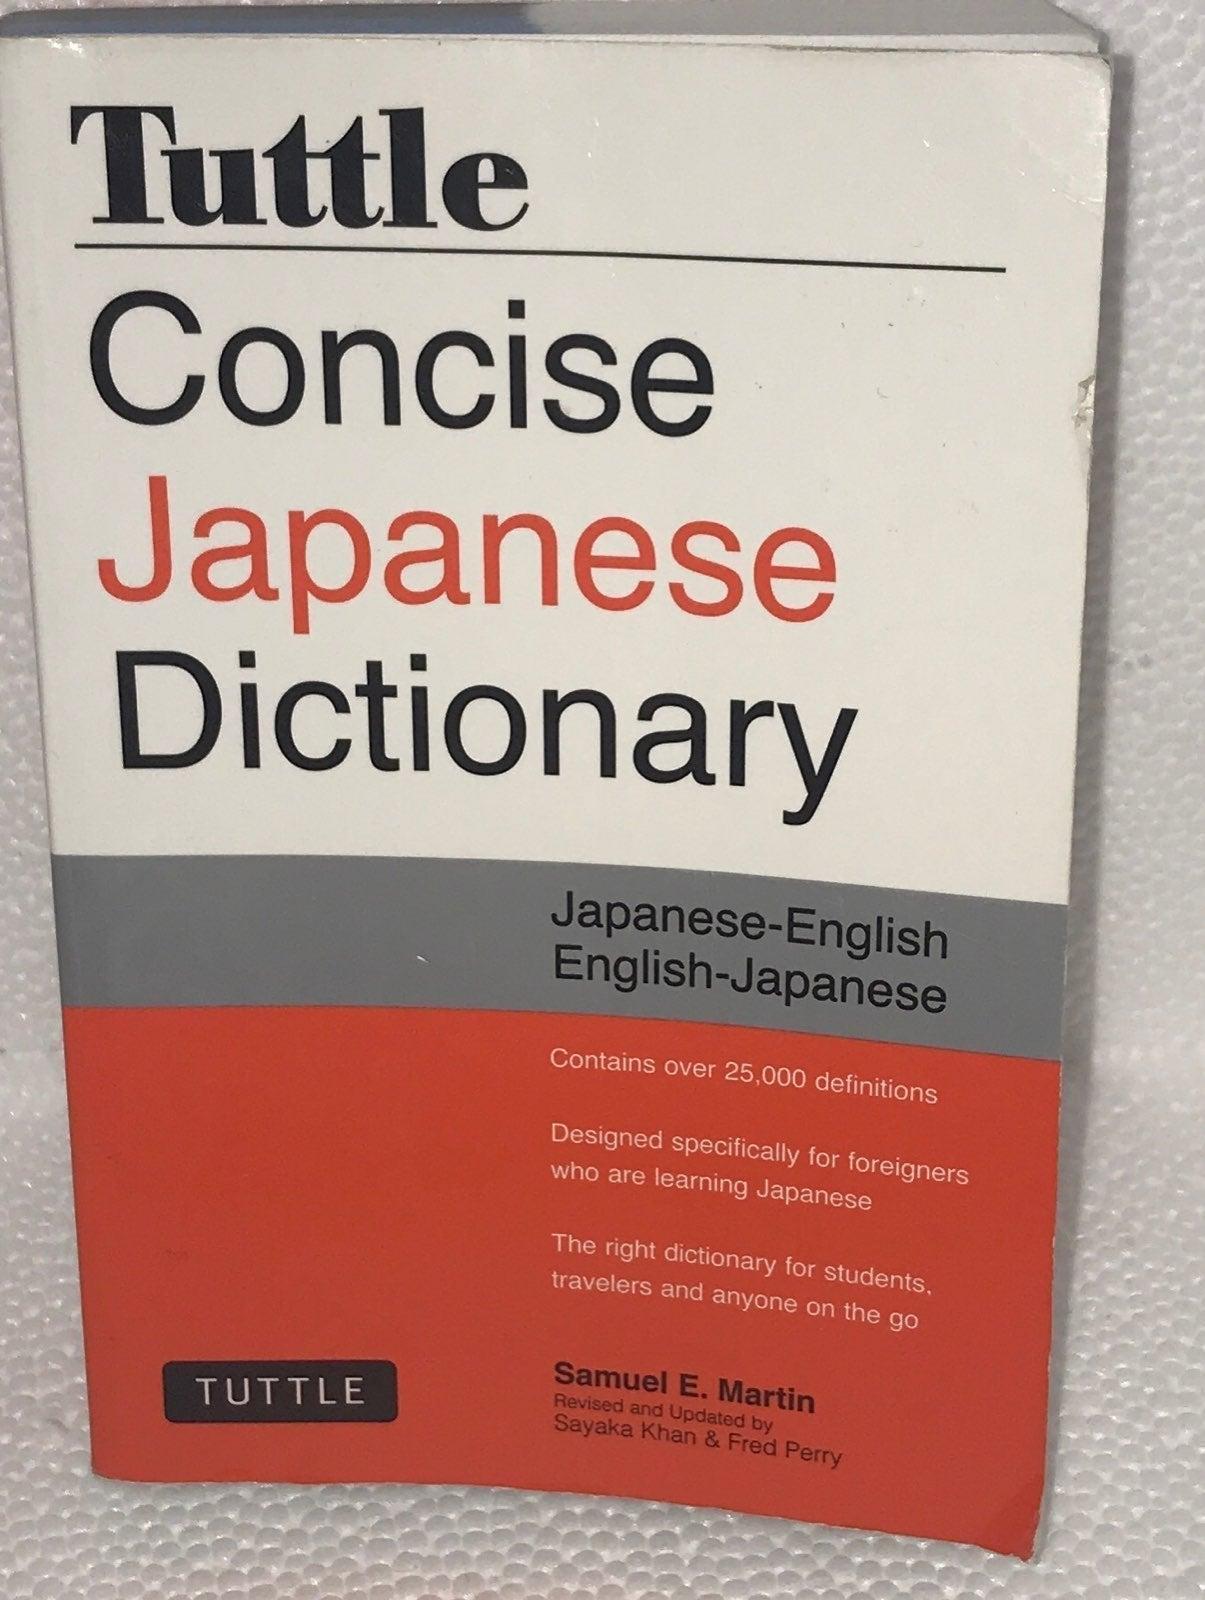 Tuttle Japanese-English dicitonary